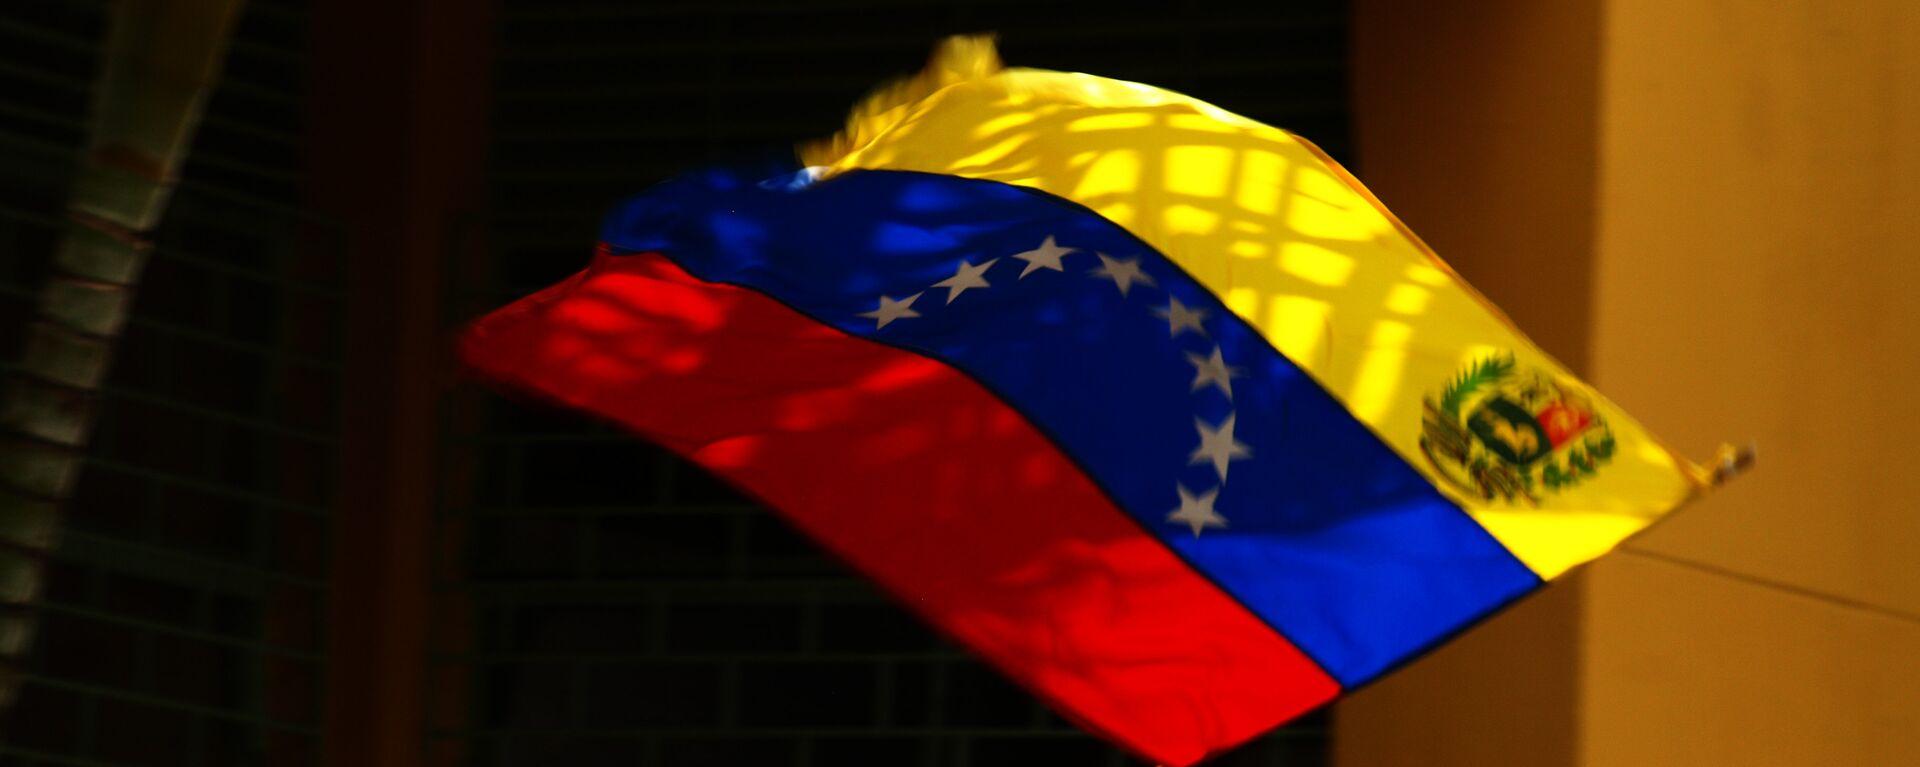 Bandera de Venezuela - Sputnik Mundo, 1920, 09.09.2021